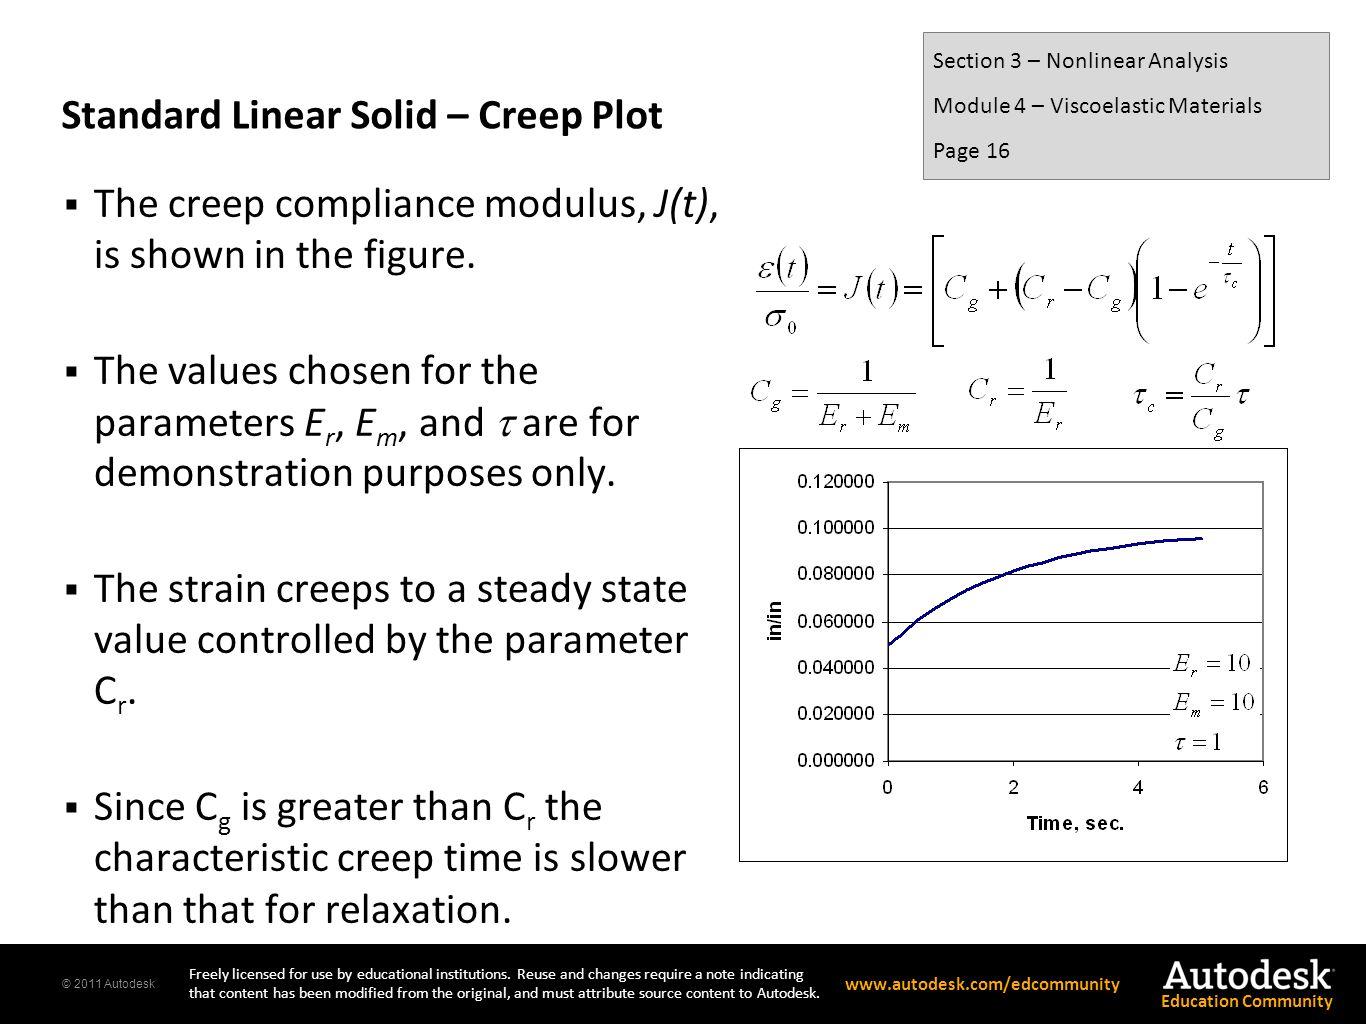 Standard Linear Solid – Creep Plot